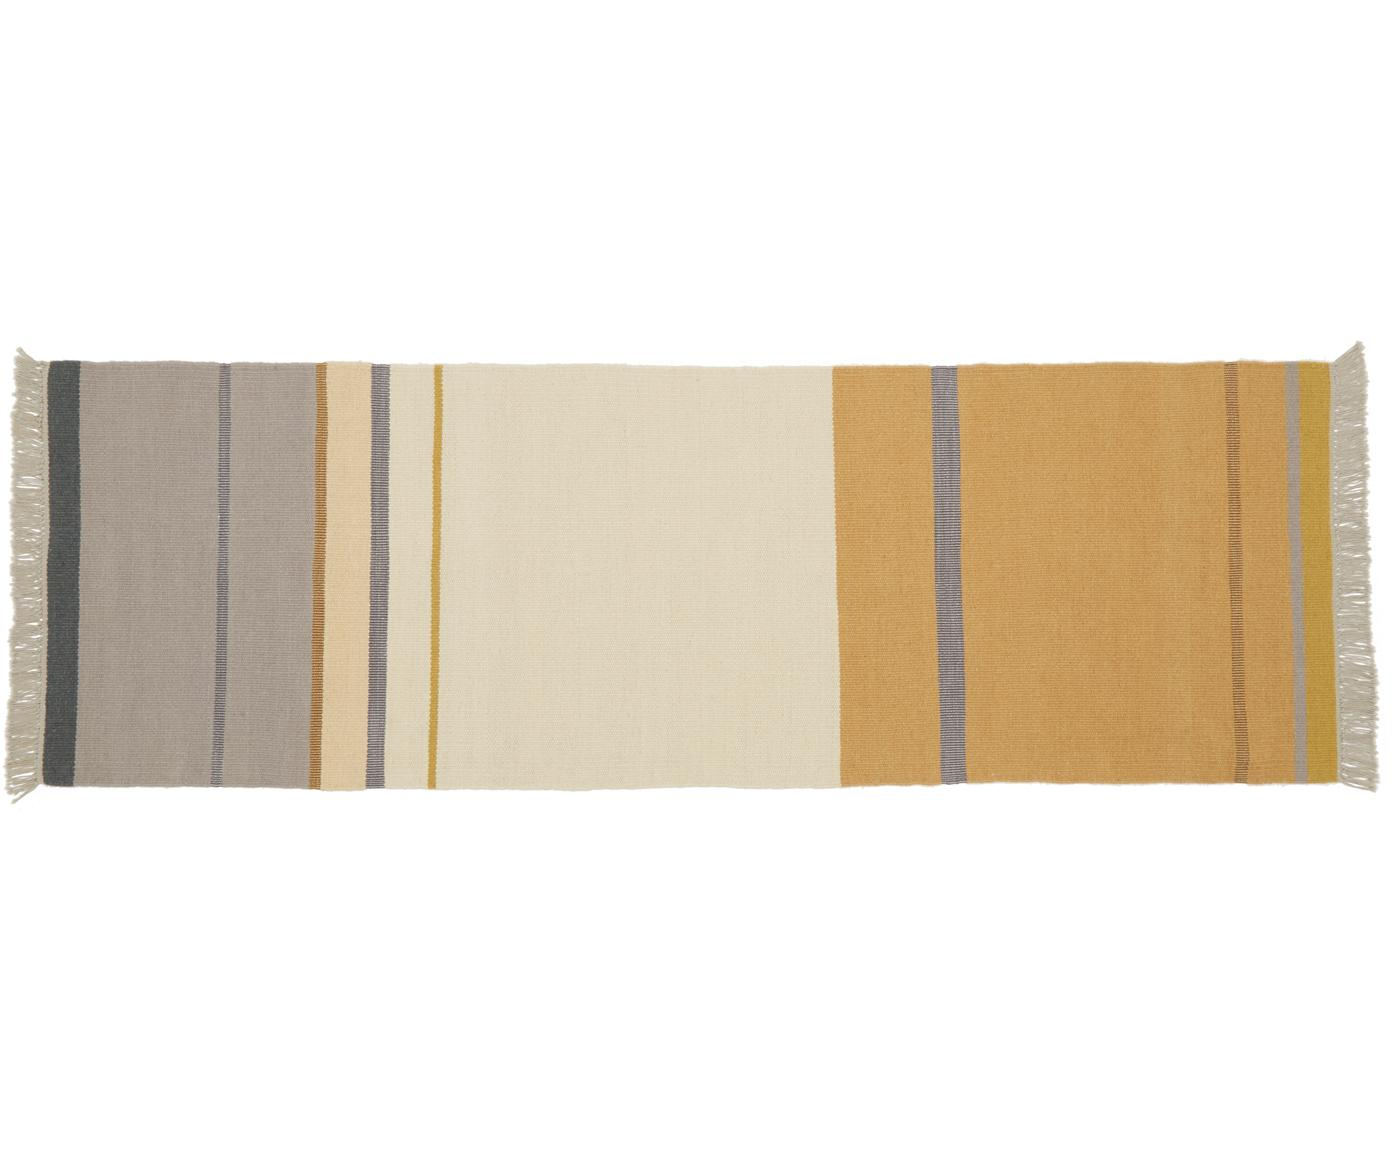 Alfombra artesanal de lana con flecos Metallum, Multicolor, An 80 x L 250 cm